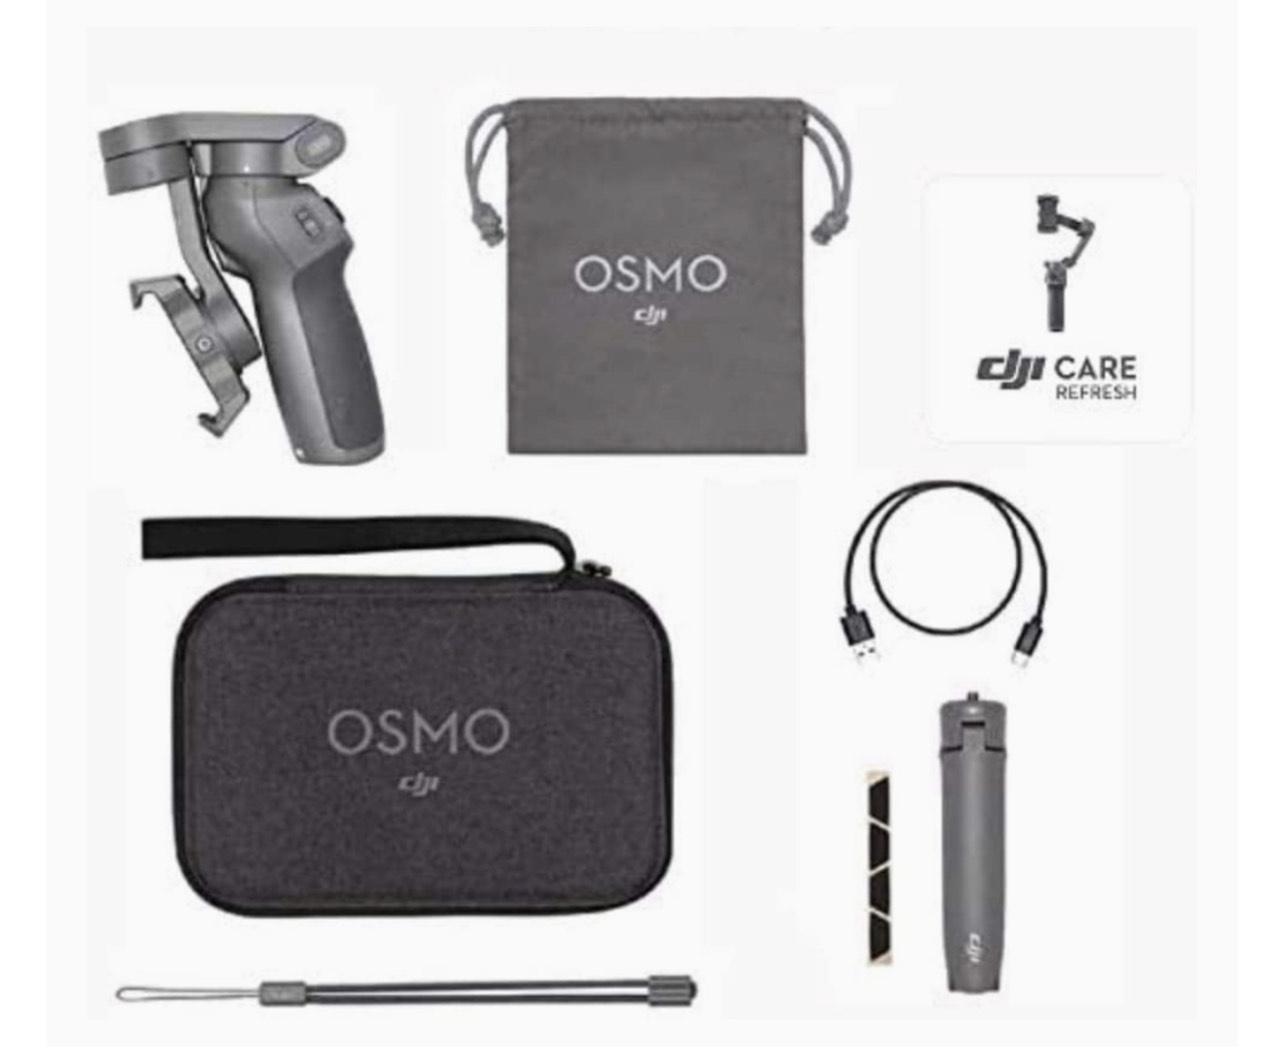 DJI Osmo Mobile 3 Prime Combo - Kit Stabilisateur de Cardan 3 Axes avec Care Refresh